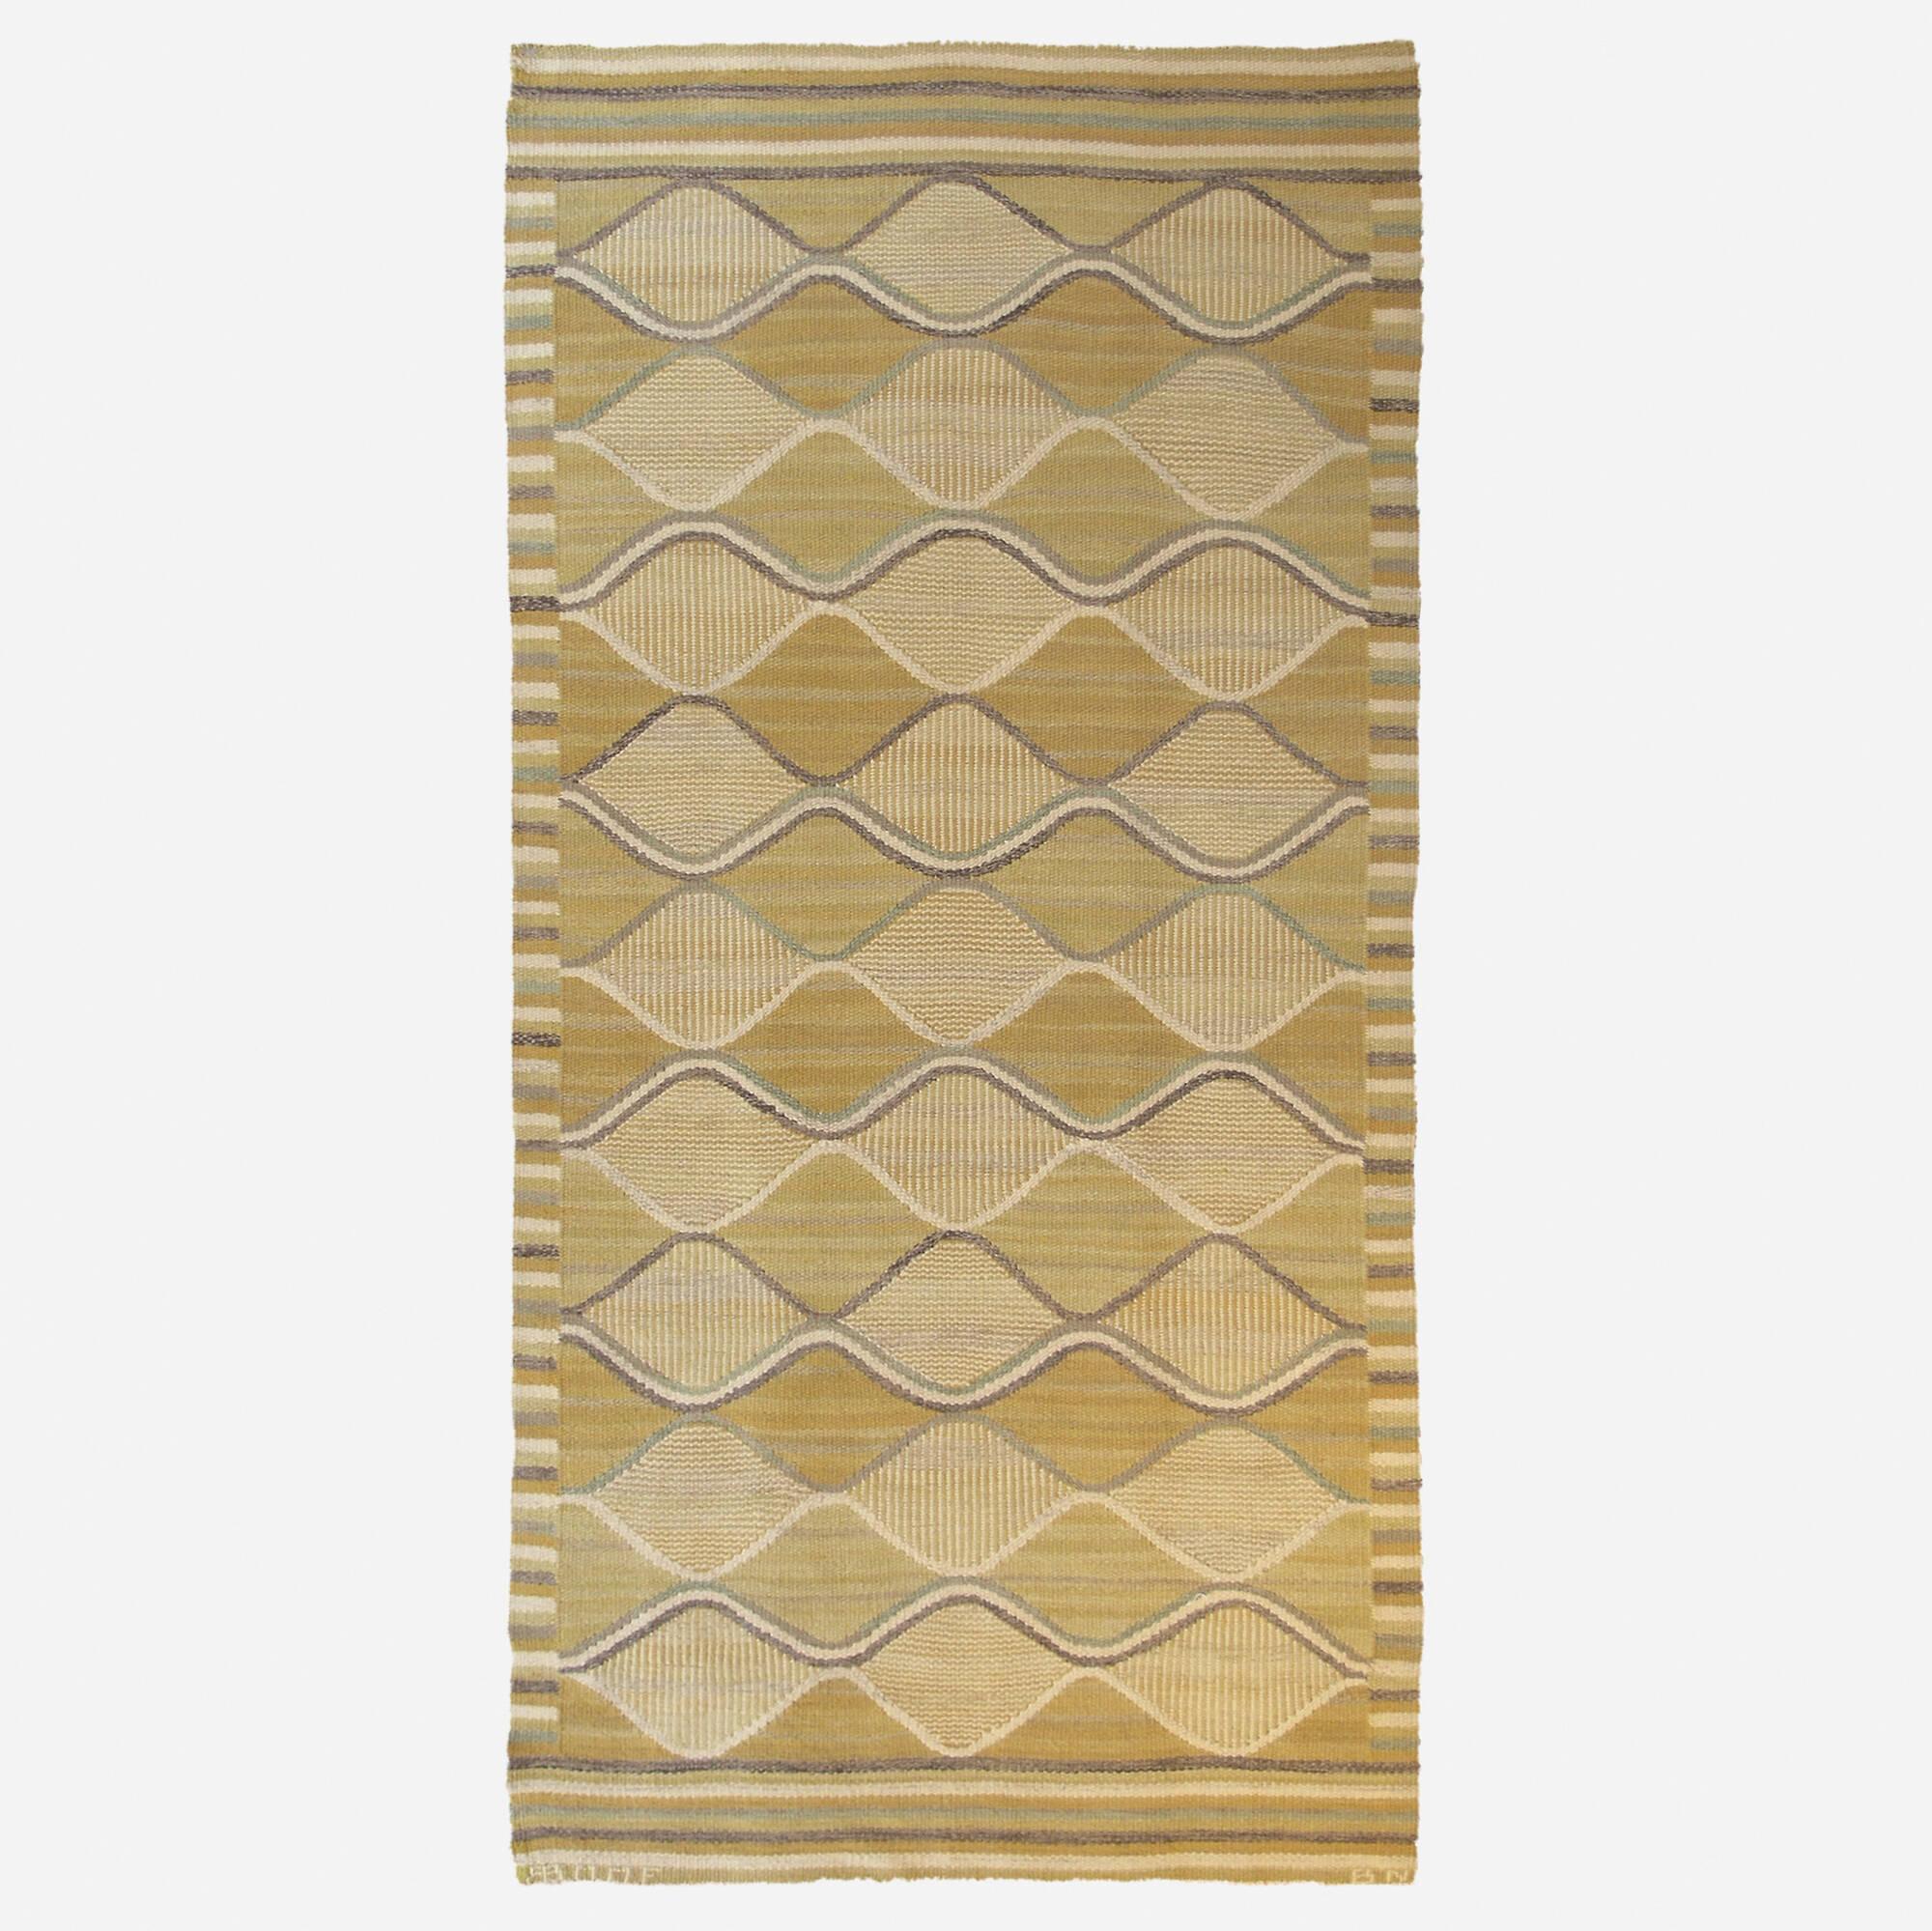 182: Barbro Nilsson / Spättan tapestry weave carpet (1 of 1)